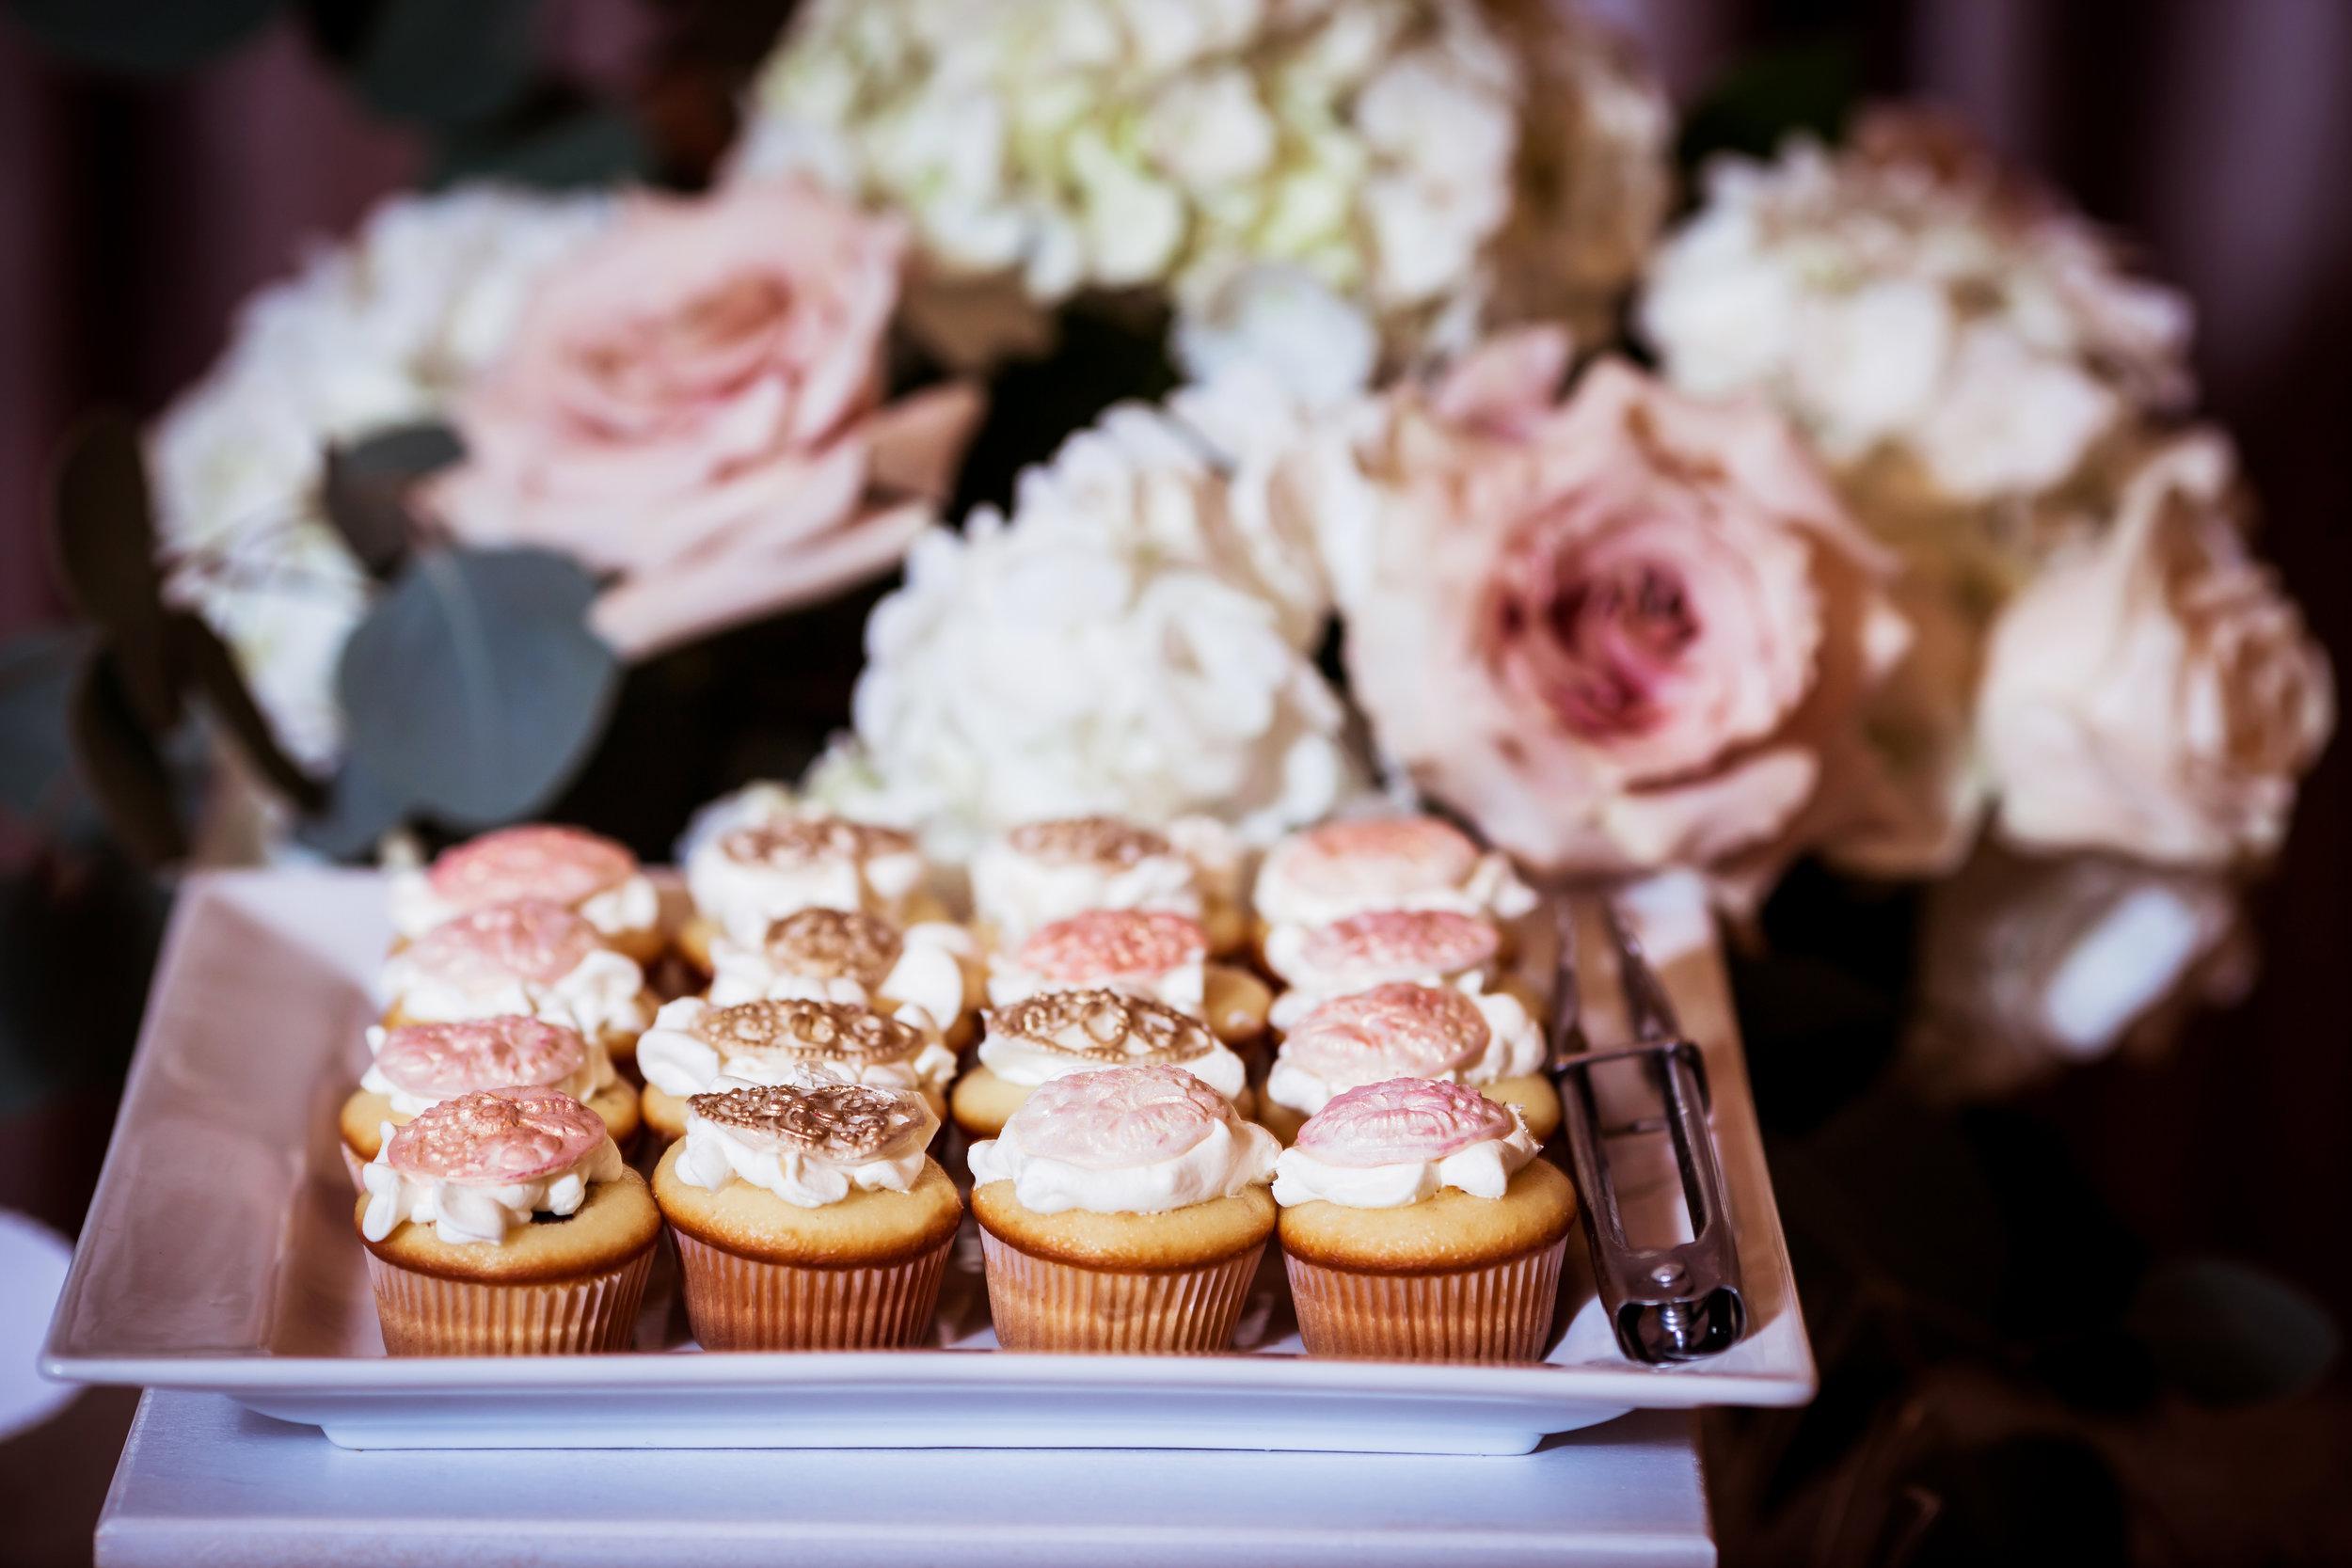 Somali Wedding Photographer Frecious catering Weddings 2017